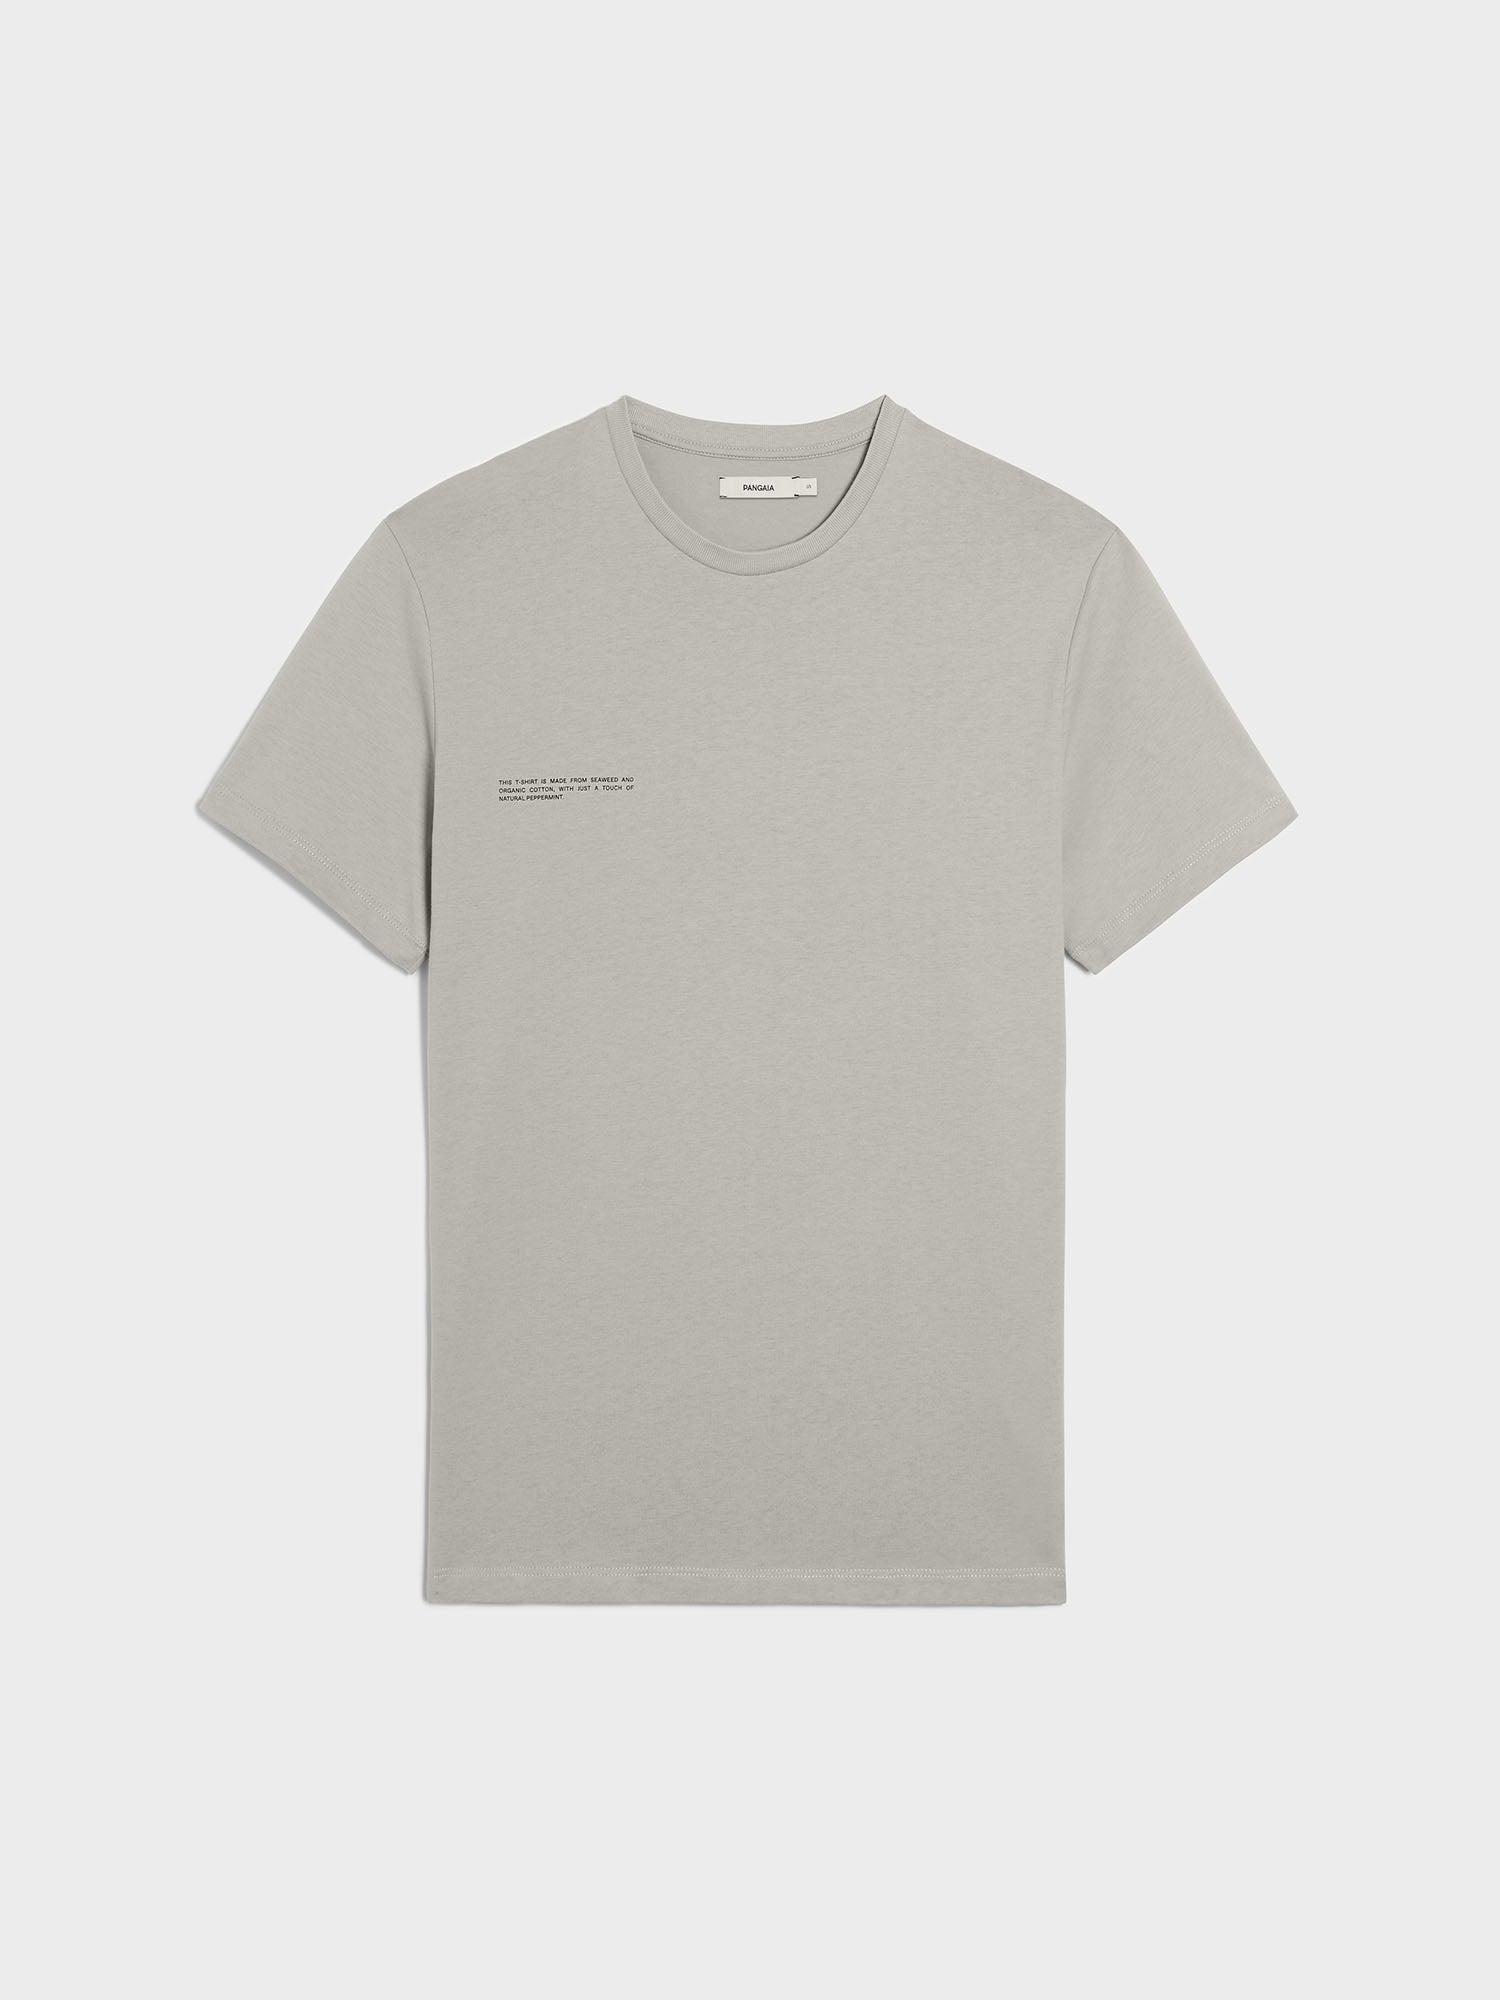 Organic cotton t-shirt with C-FIBER™